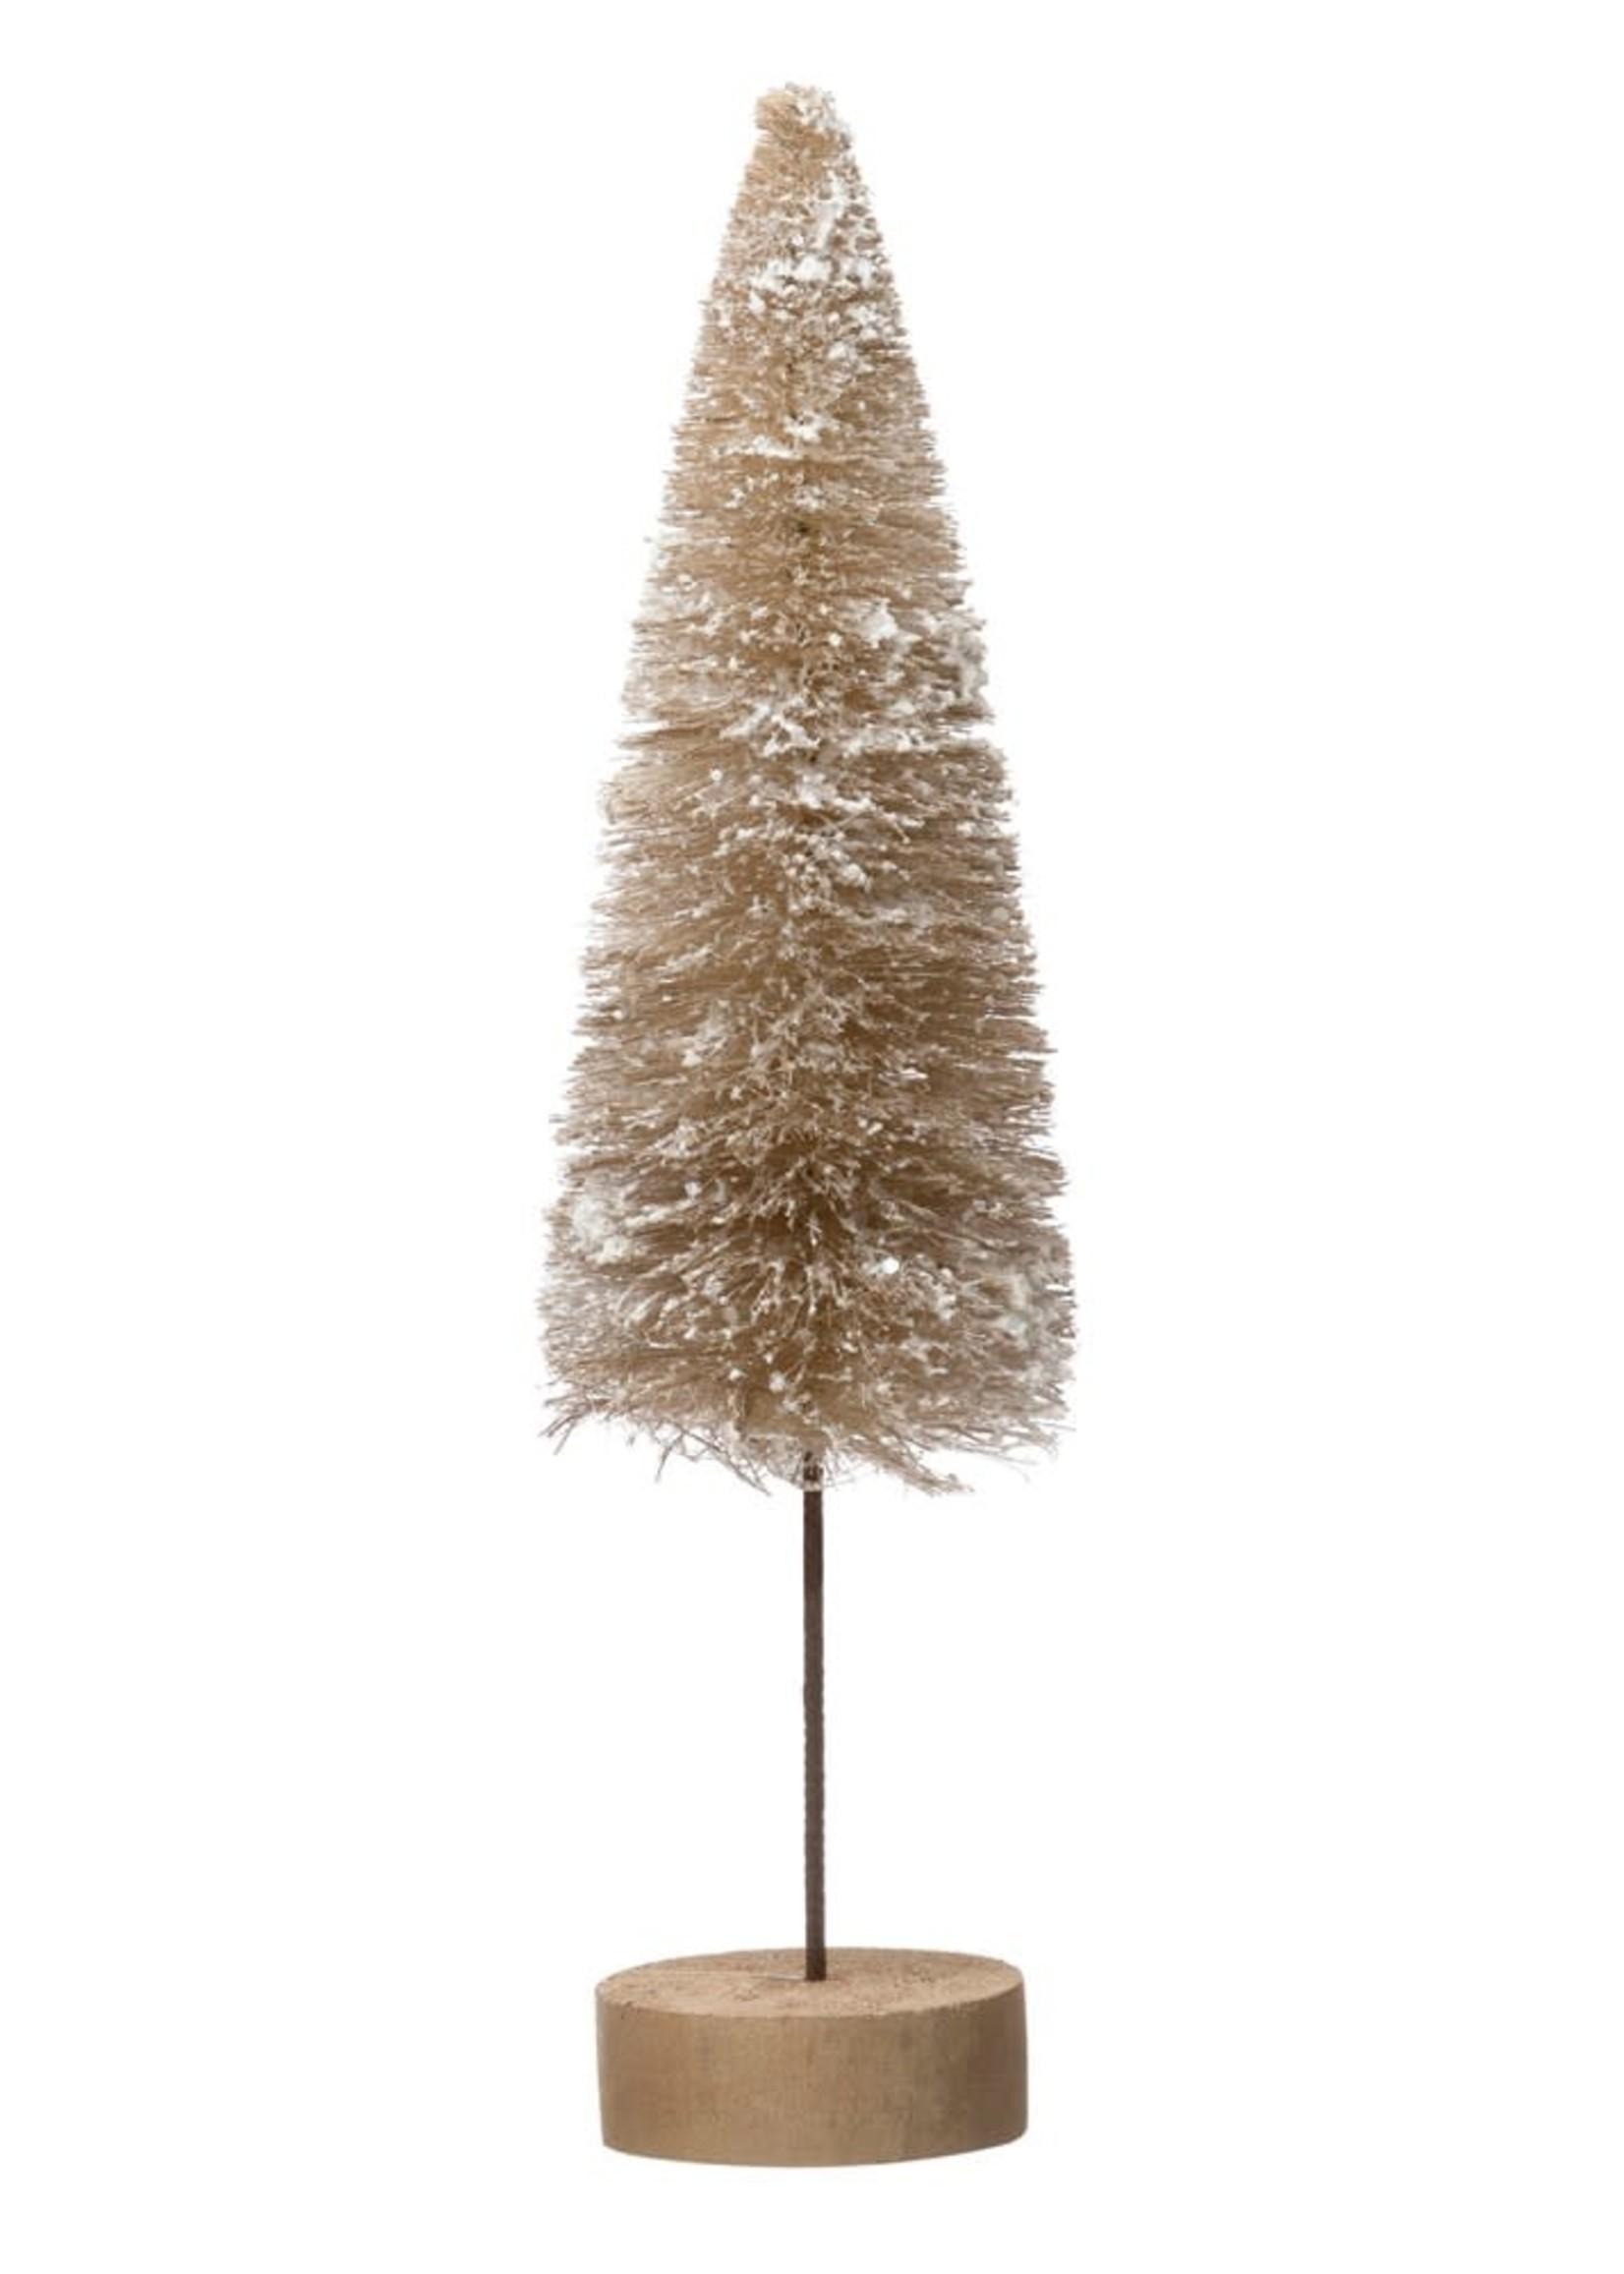 "4"" Round x 16""H Sisal Bottle Brush Tree w/ Faux Snow & Wood Base, Tan Color"